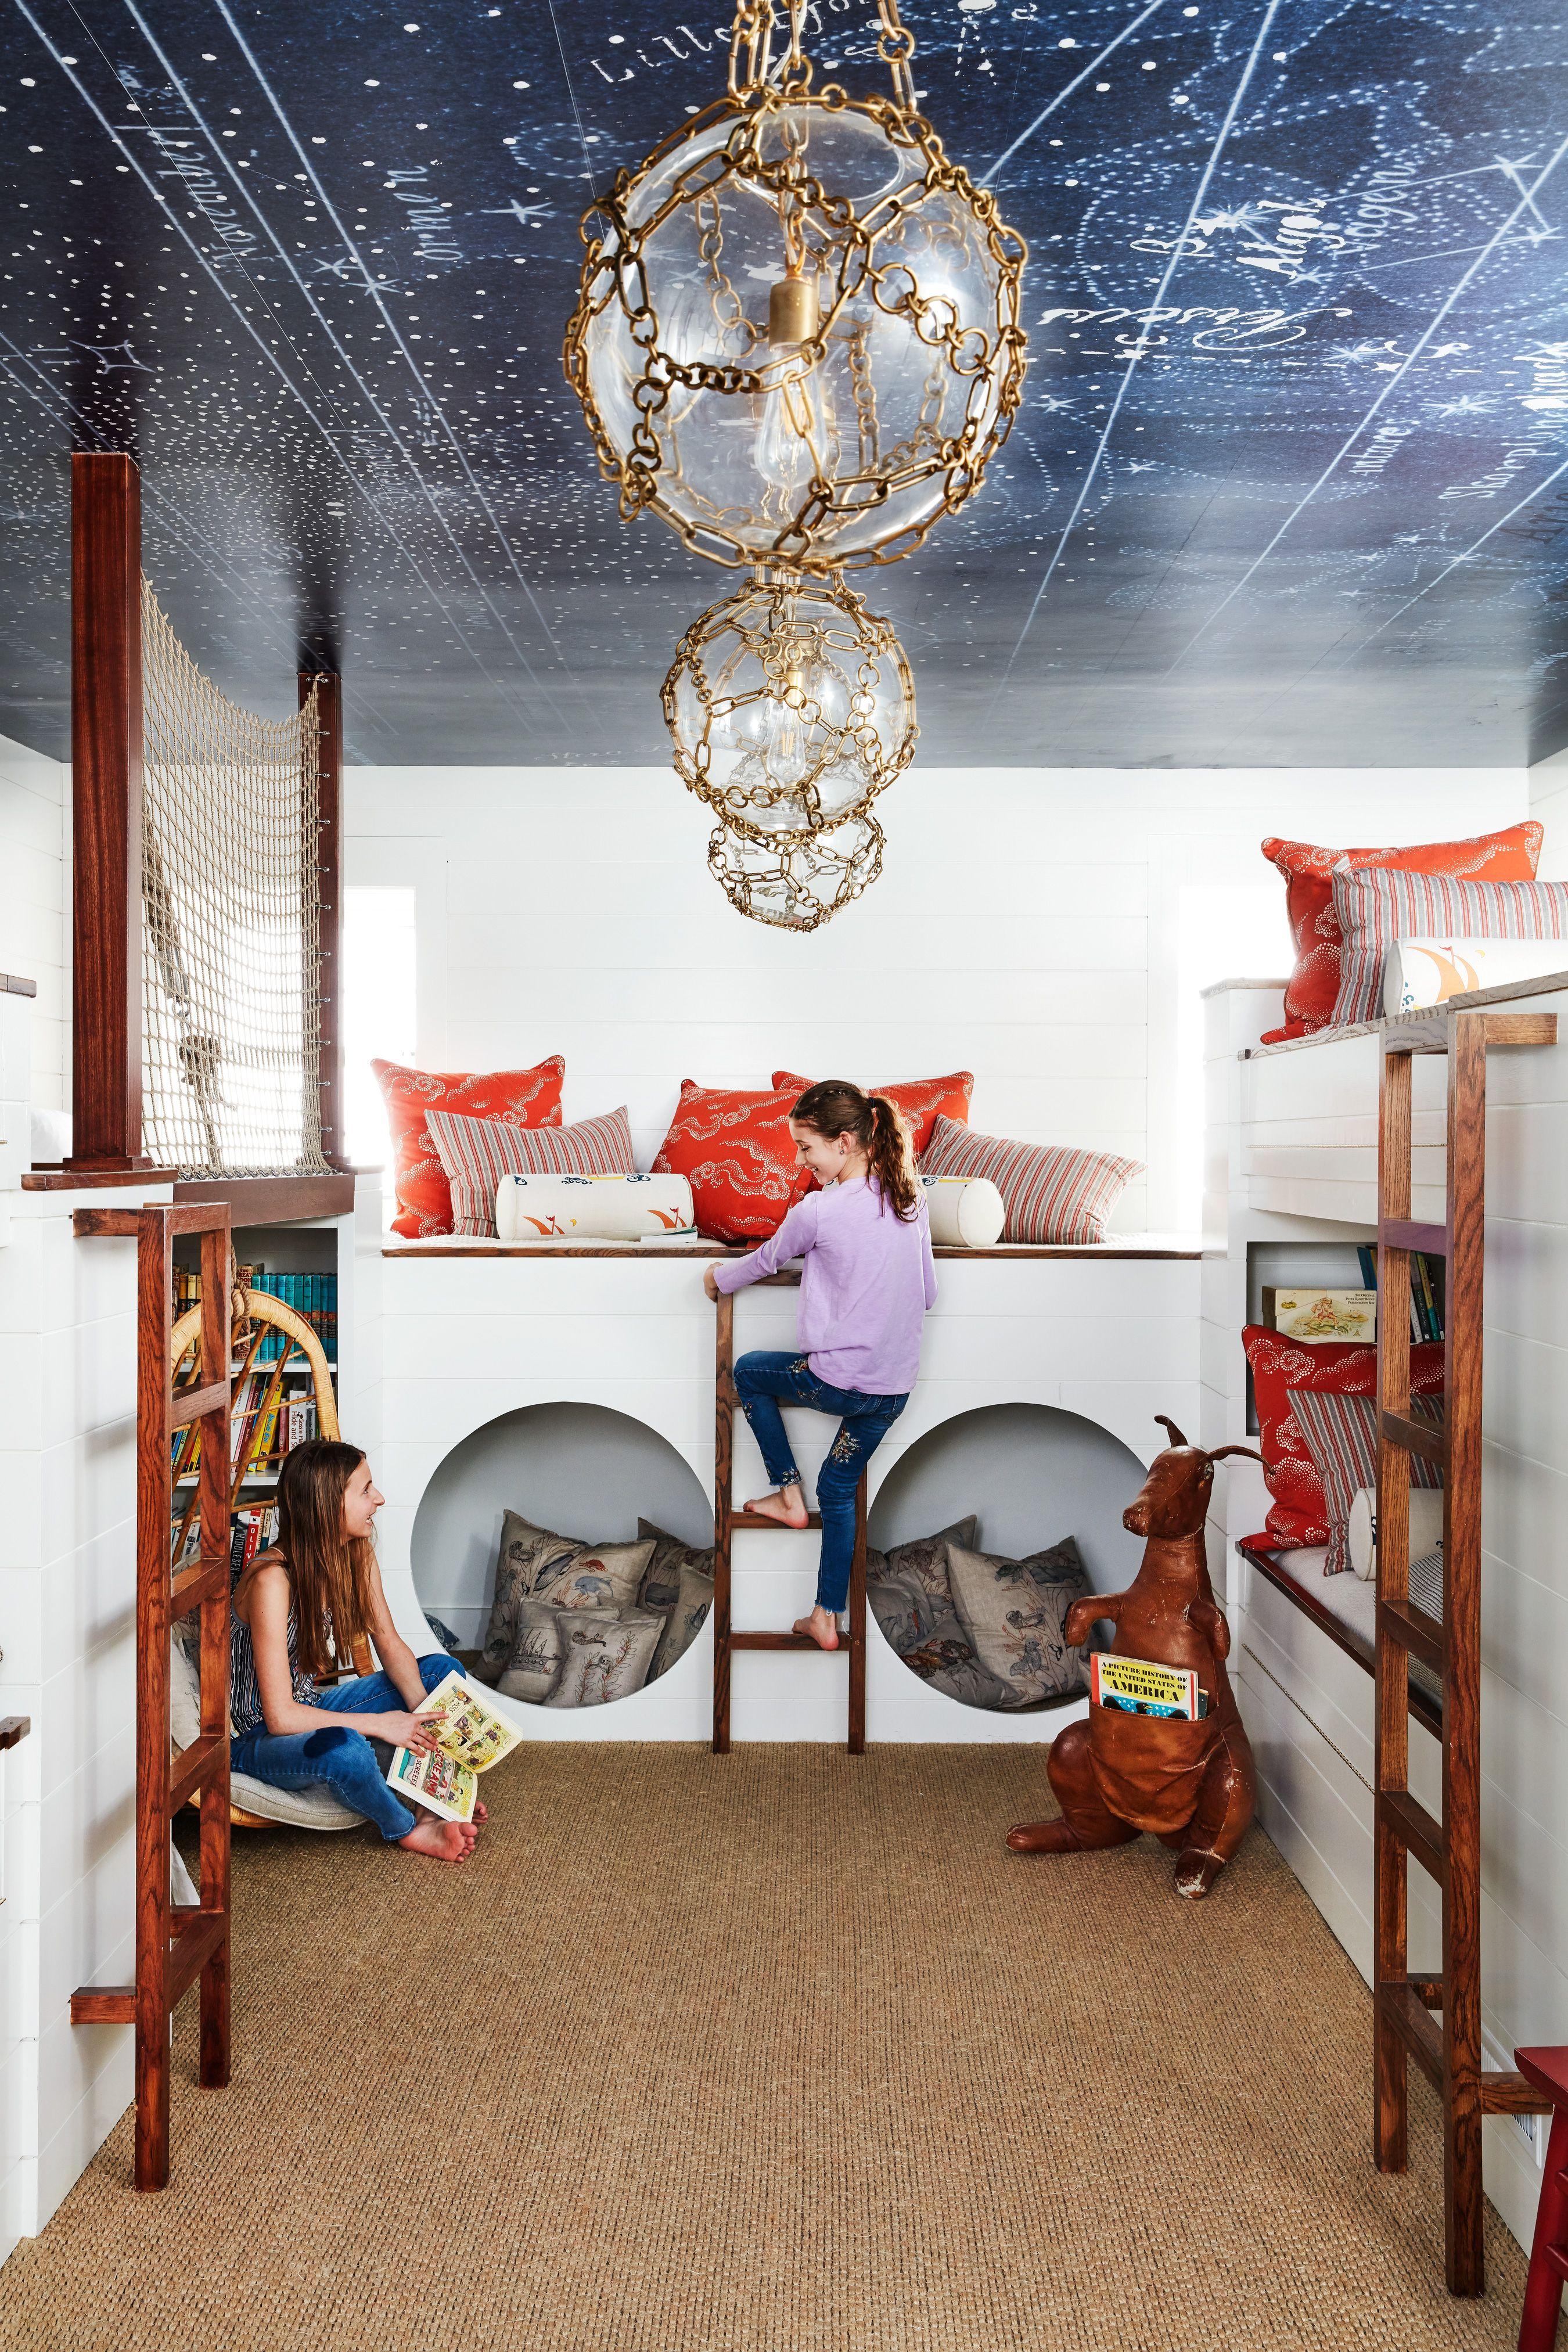 11 Epic Playroom Ideas - Fun Playroom Decorating Tips